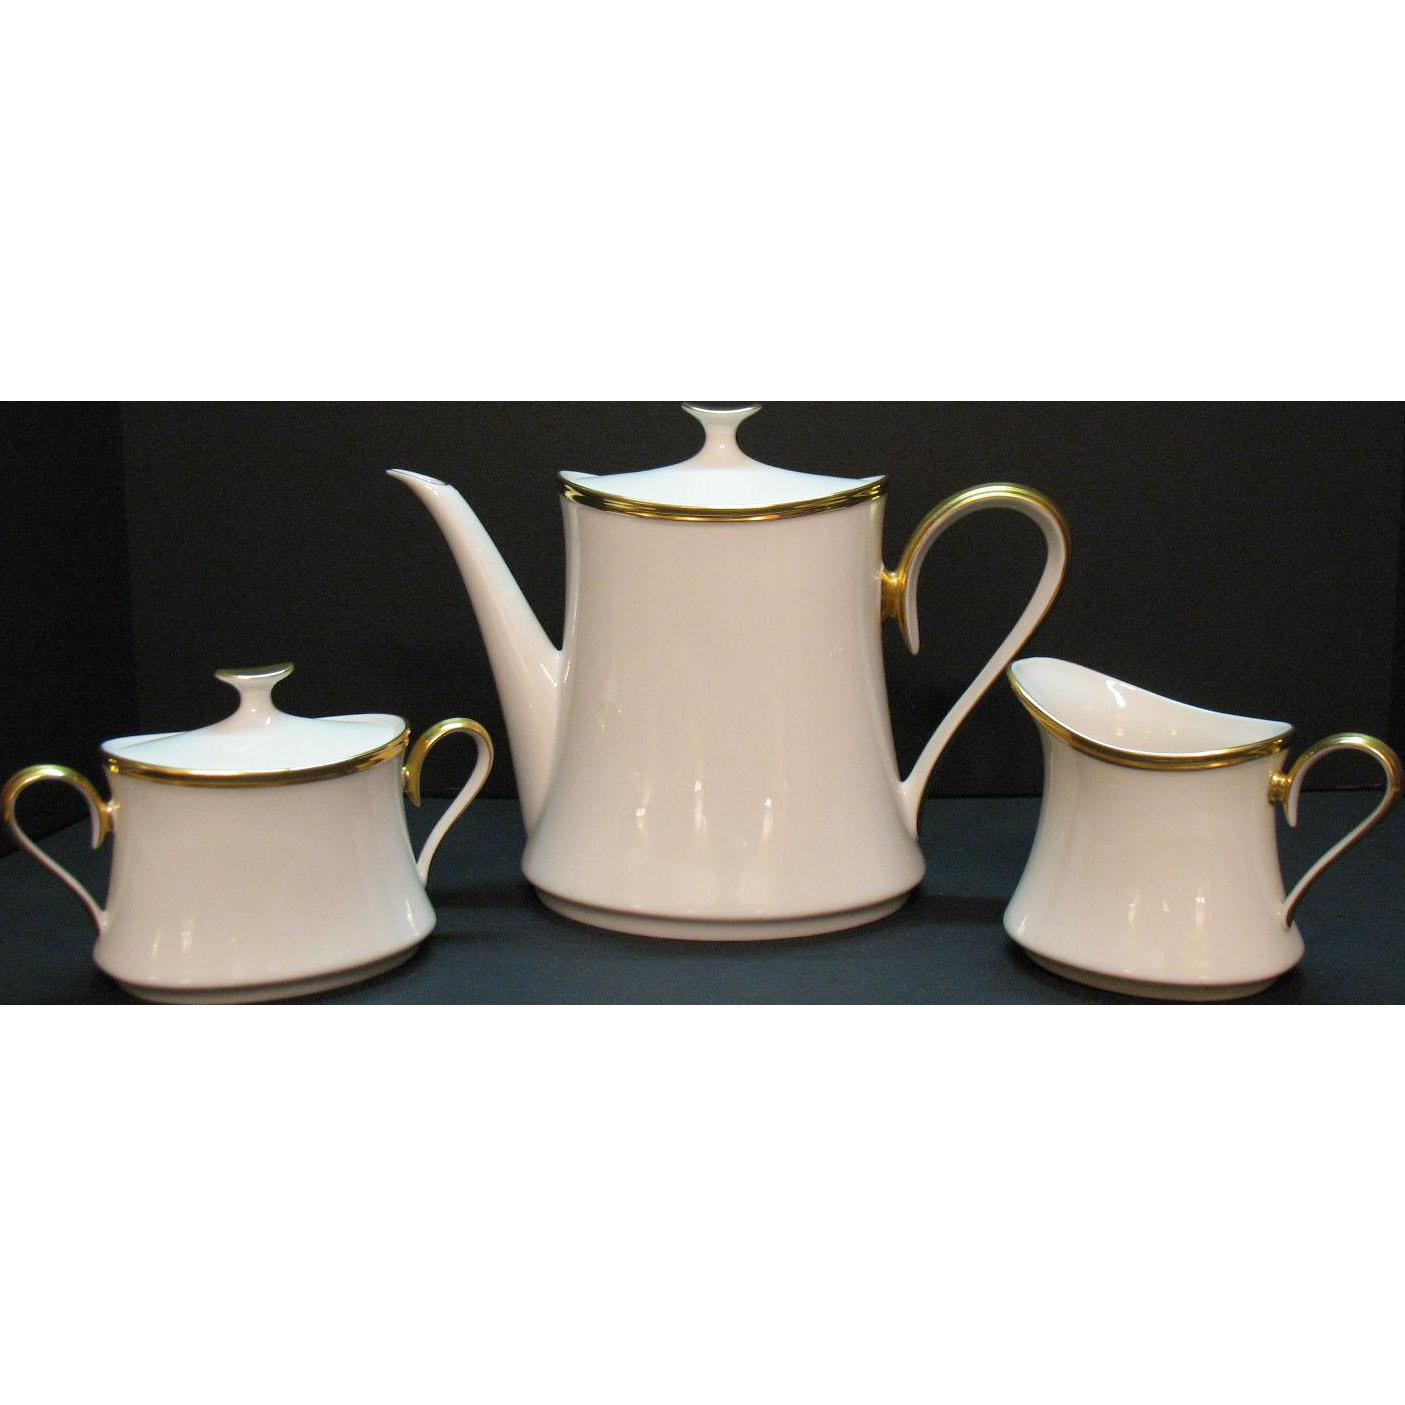 Vintage Lenox Tea/Coffee Pot Sugar & Creamer Set Eternal Pattern 1960-70s Very Good Condition